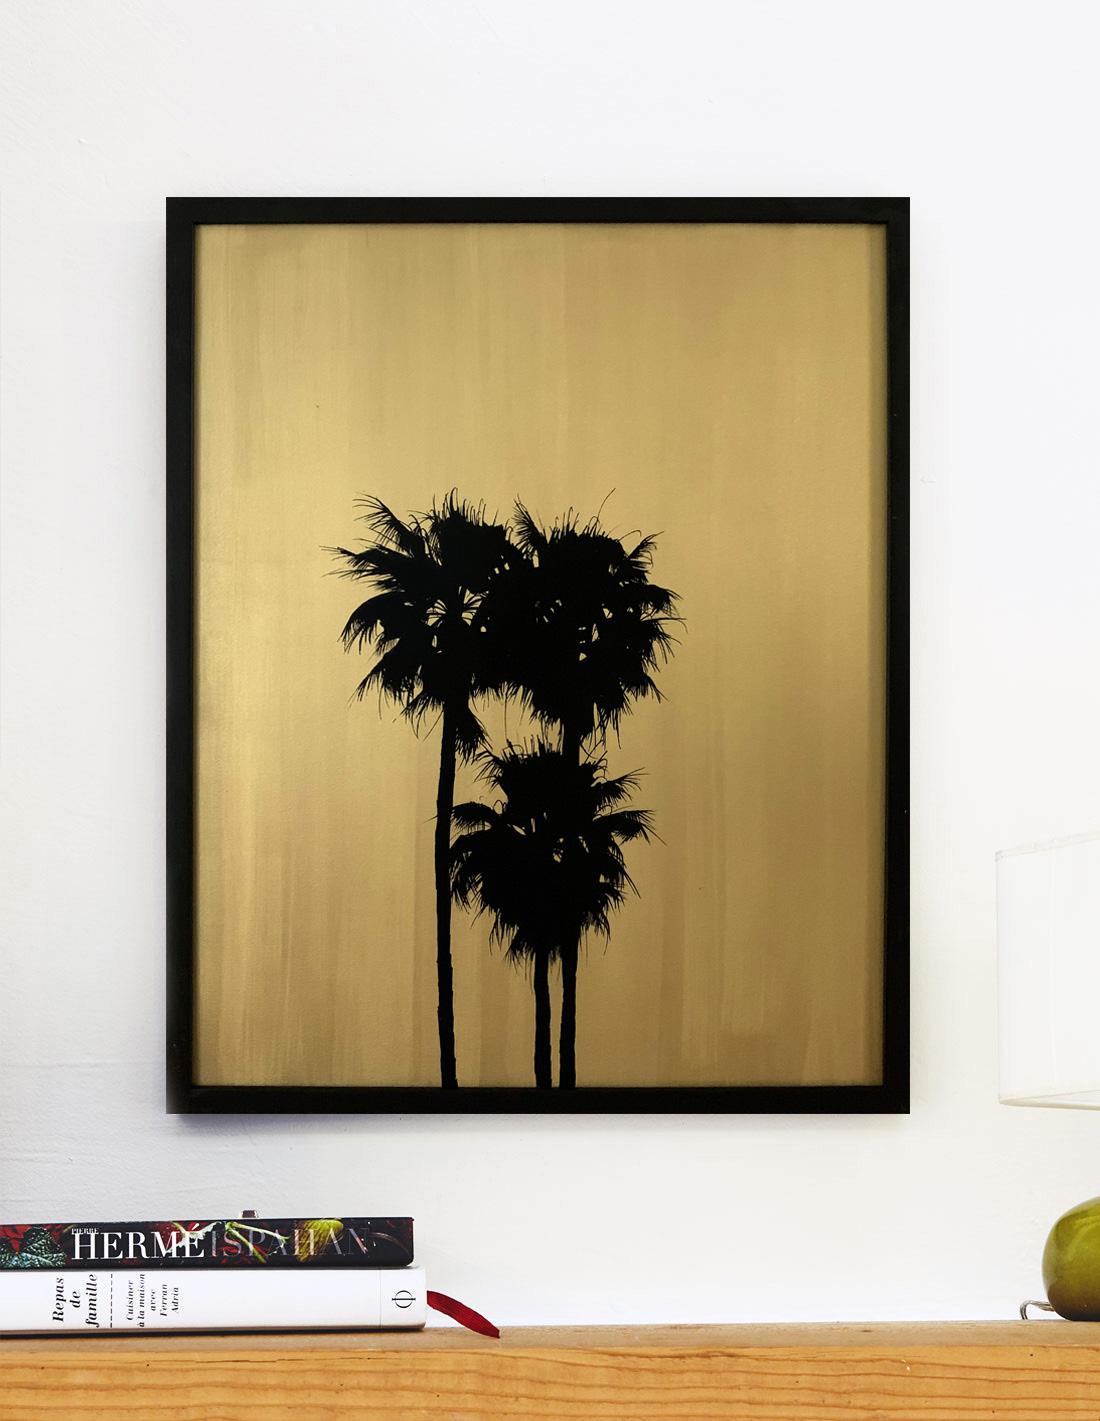 Moyens palmtrees VI - Tableau- Hubert Jouzeau